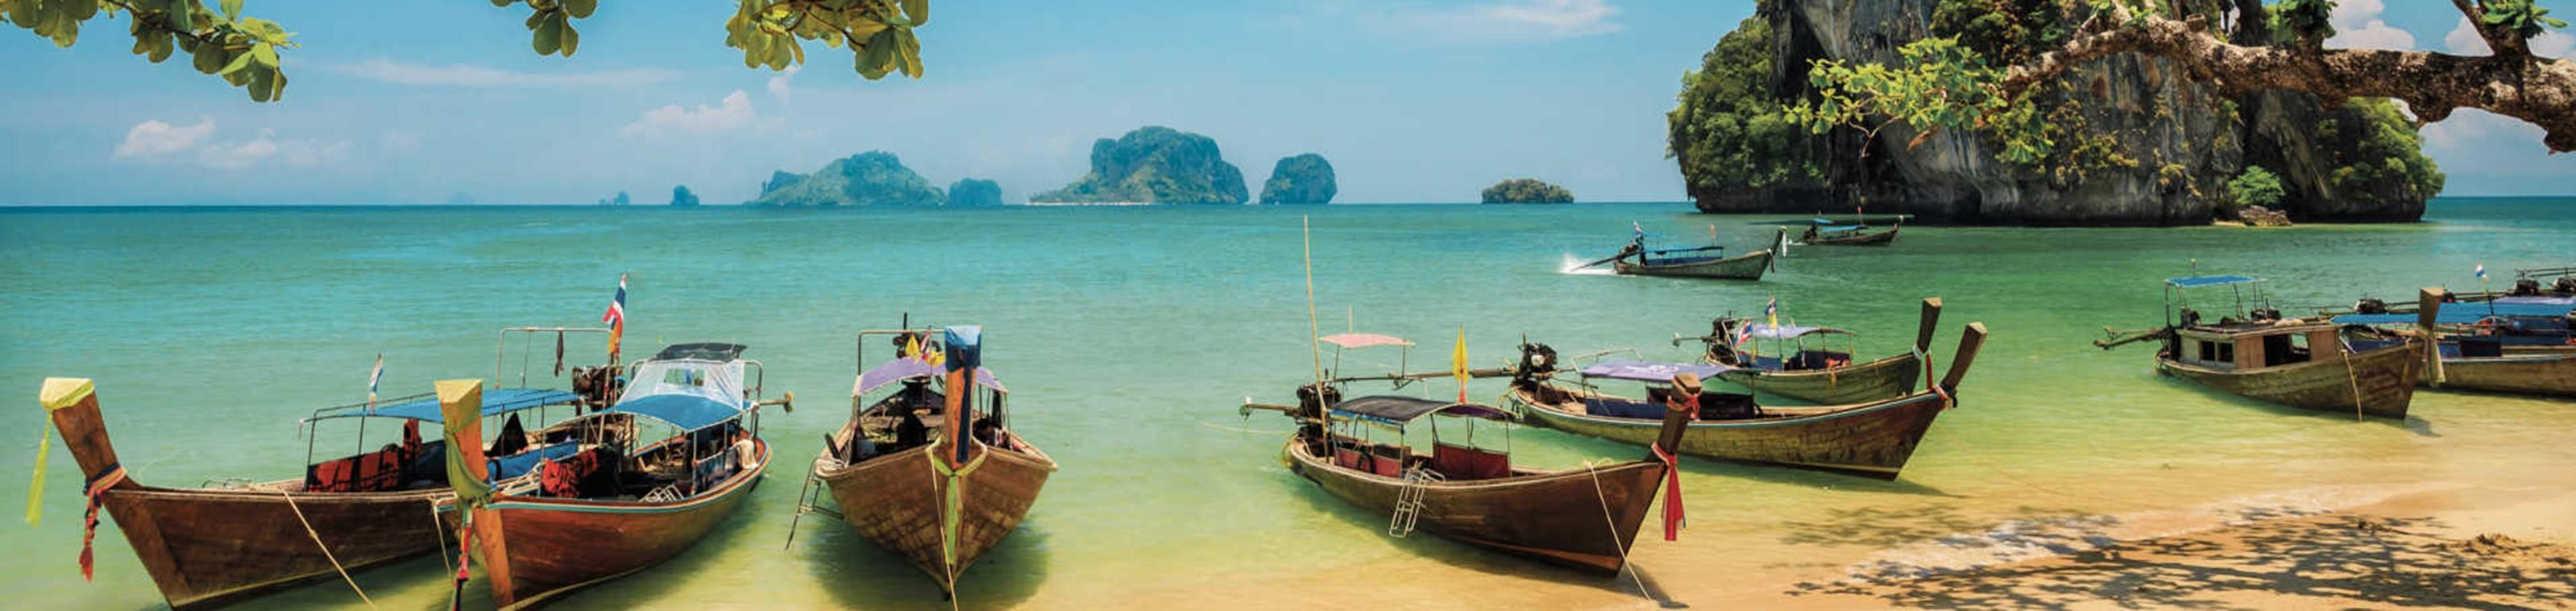 Thailand Classic Deluxe tour